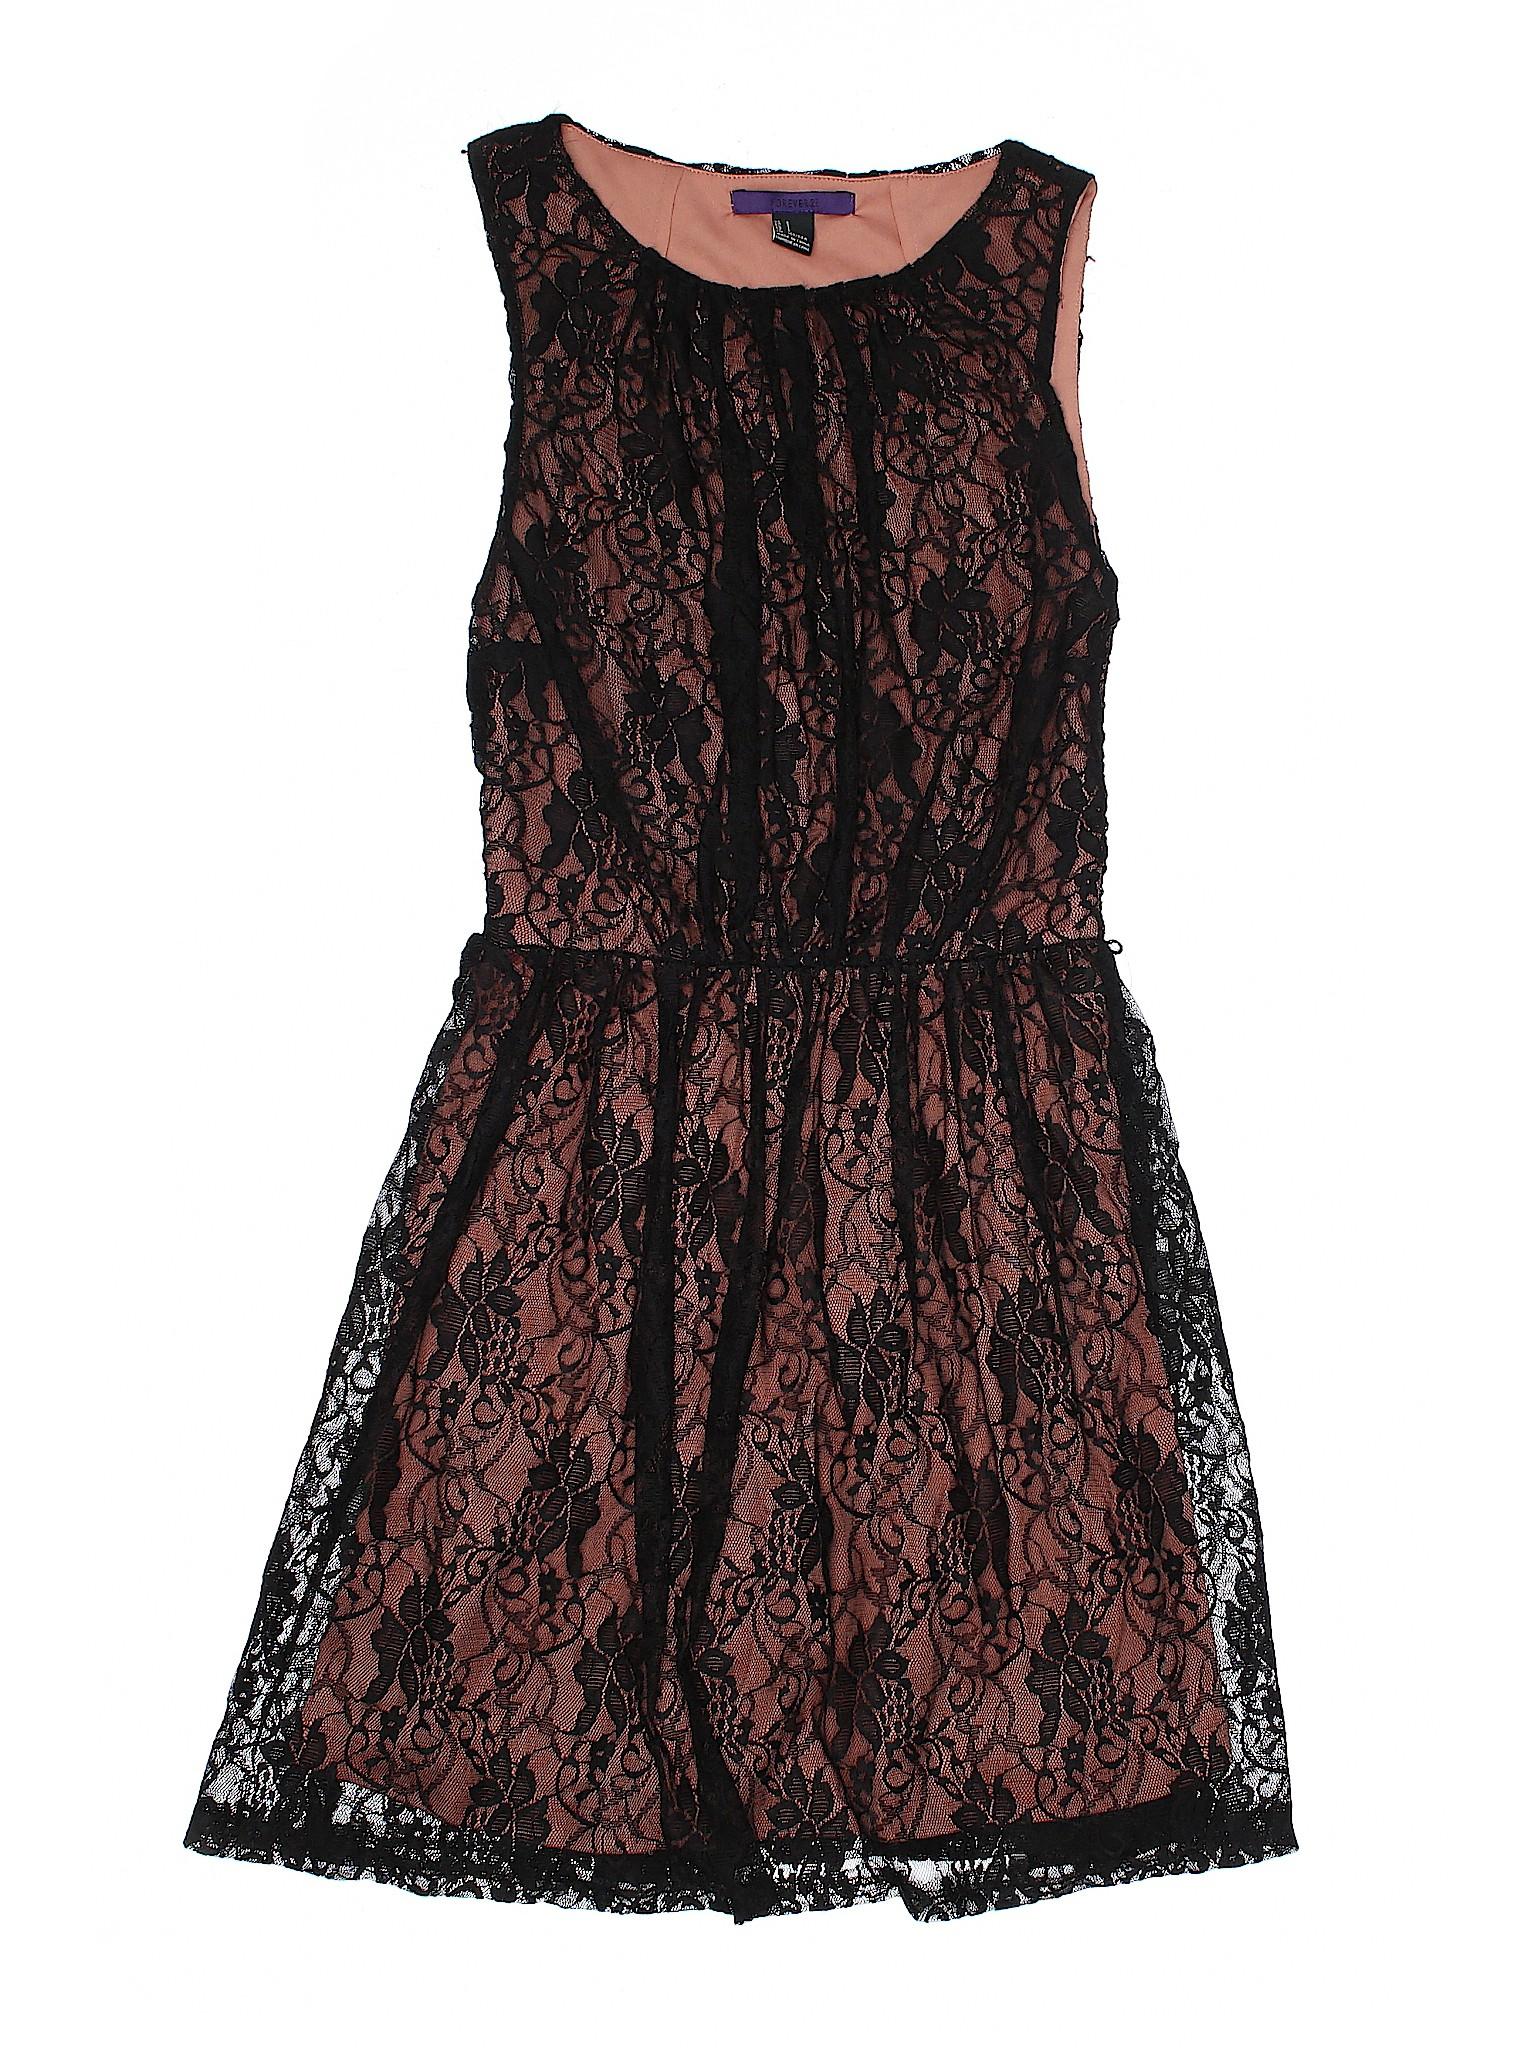 Casual winter Dress Forever 21 Boutique 8BCwqCnt